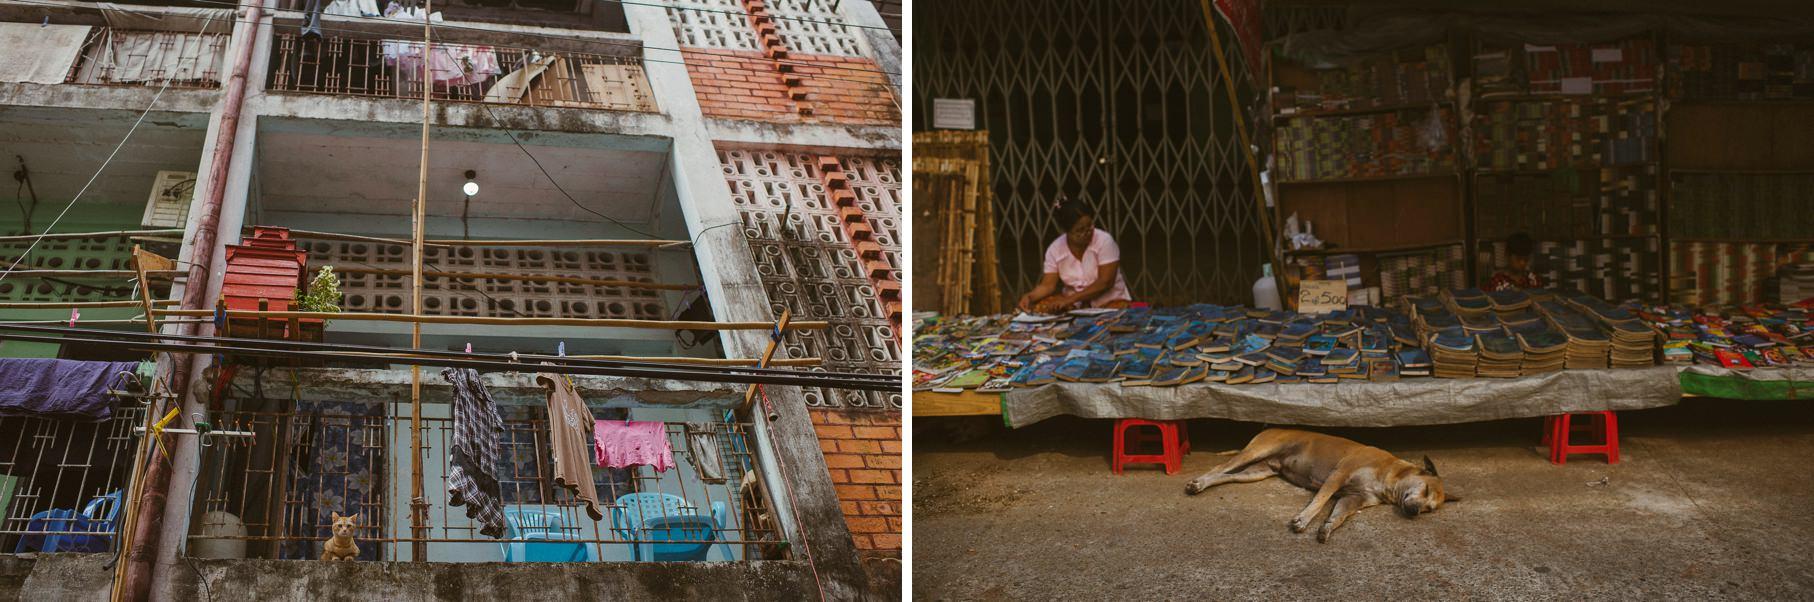 0007 yangon mandalay d76 4289 - Großstädte Myanmars - Yangon & Mandalay